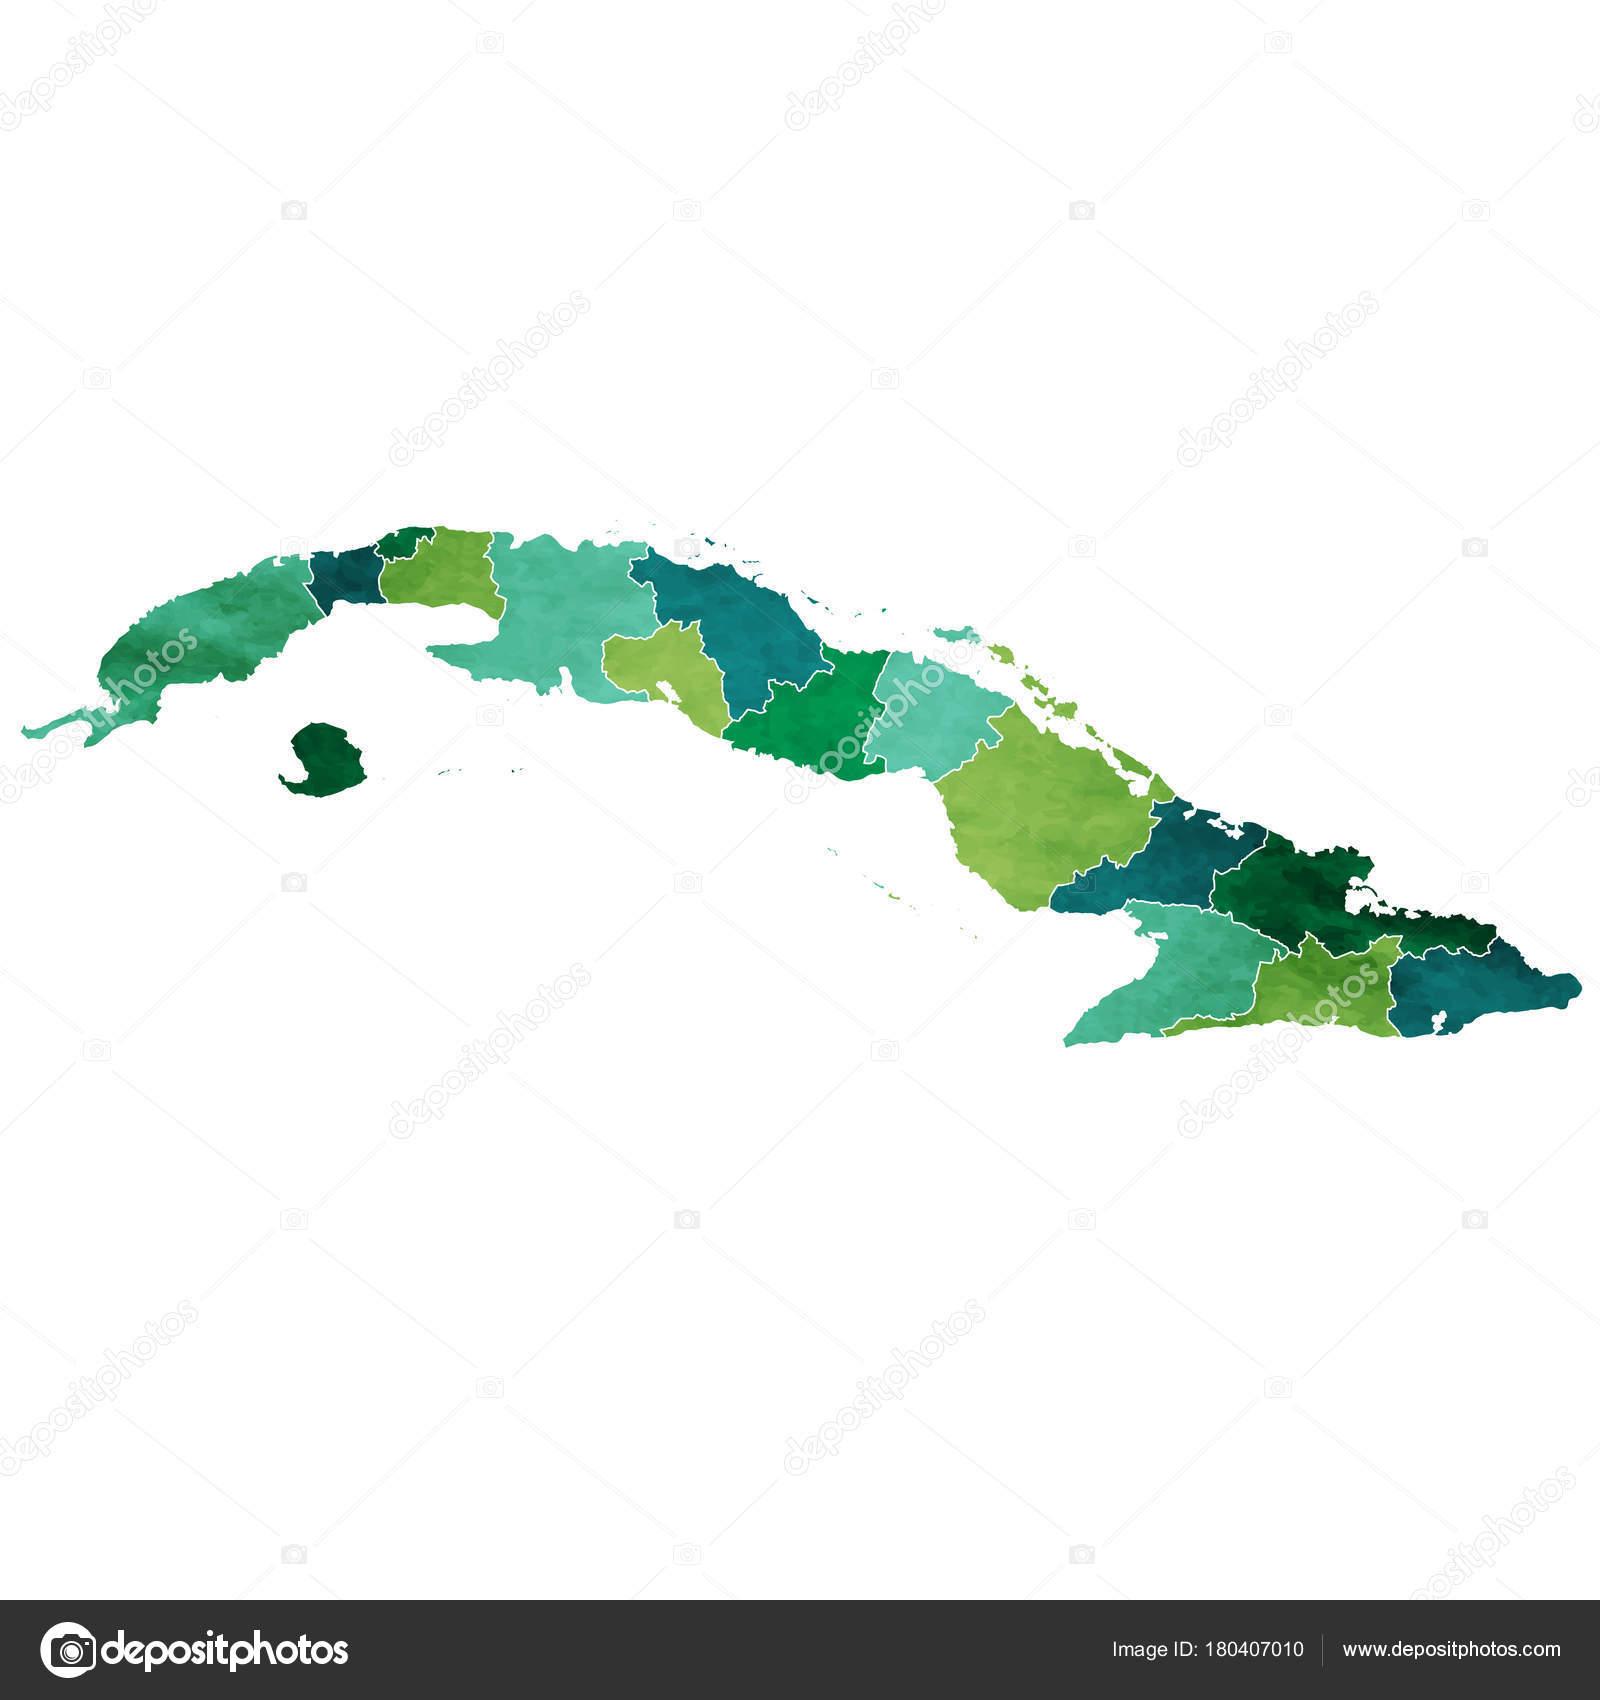 Cuba World Map Country Icon Stock Vector C Jboy24 180407010